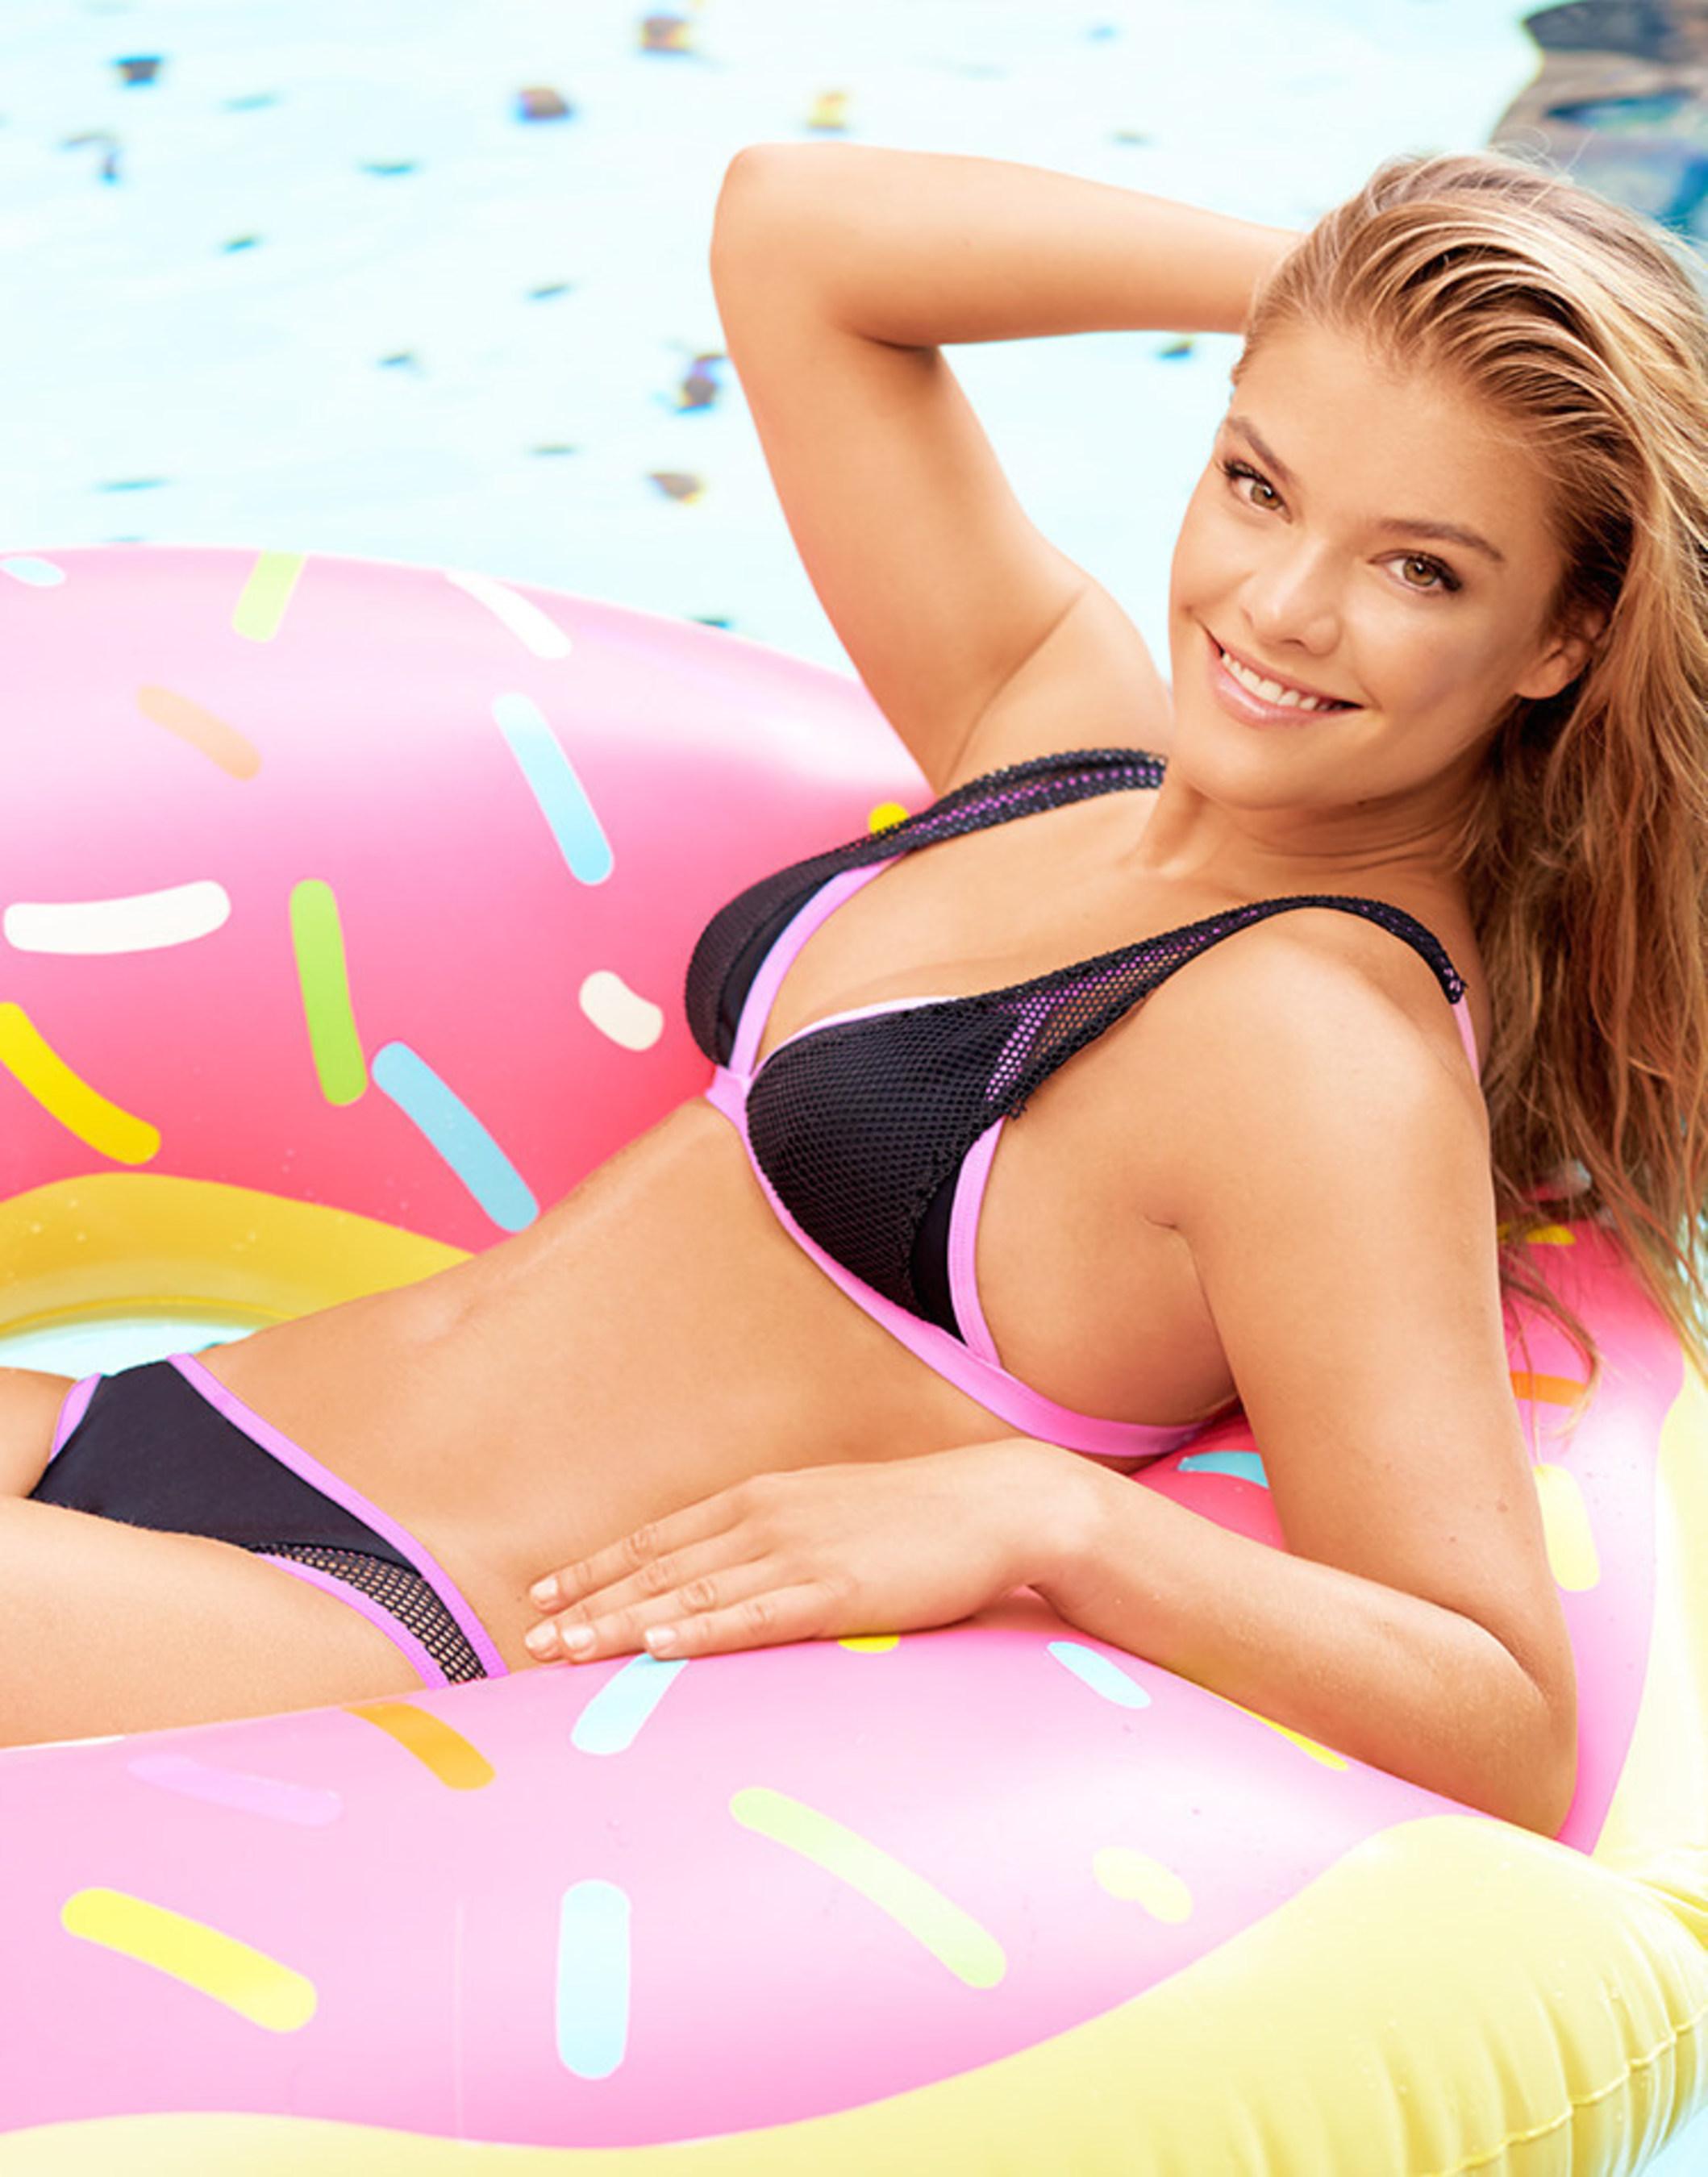 Nina Agdal Headlines Adore Me's 2016 Swimwear Campaign